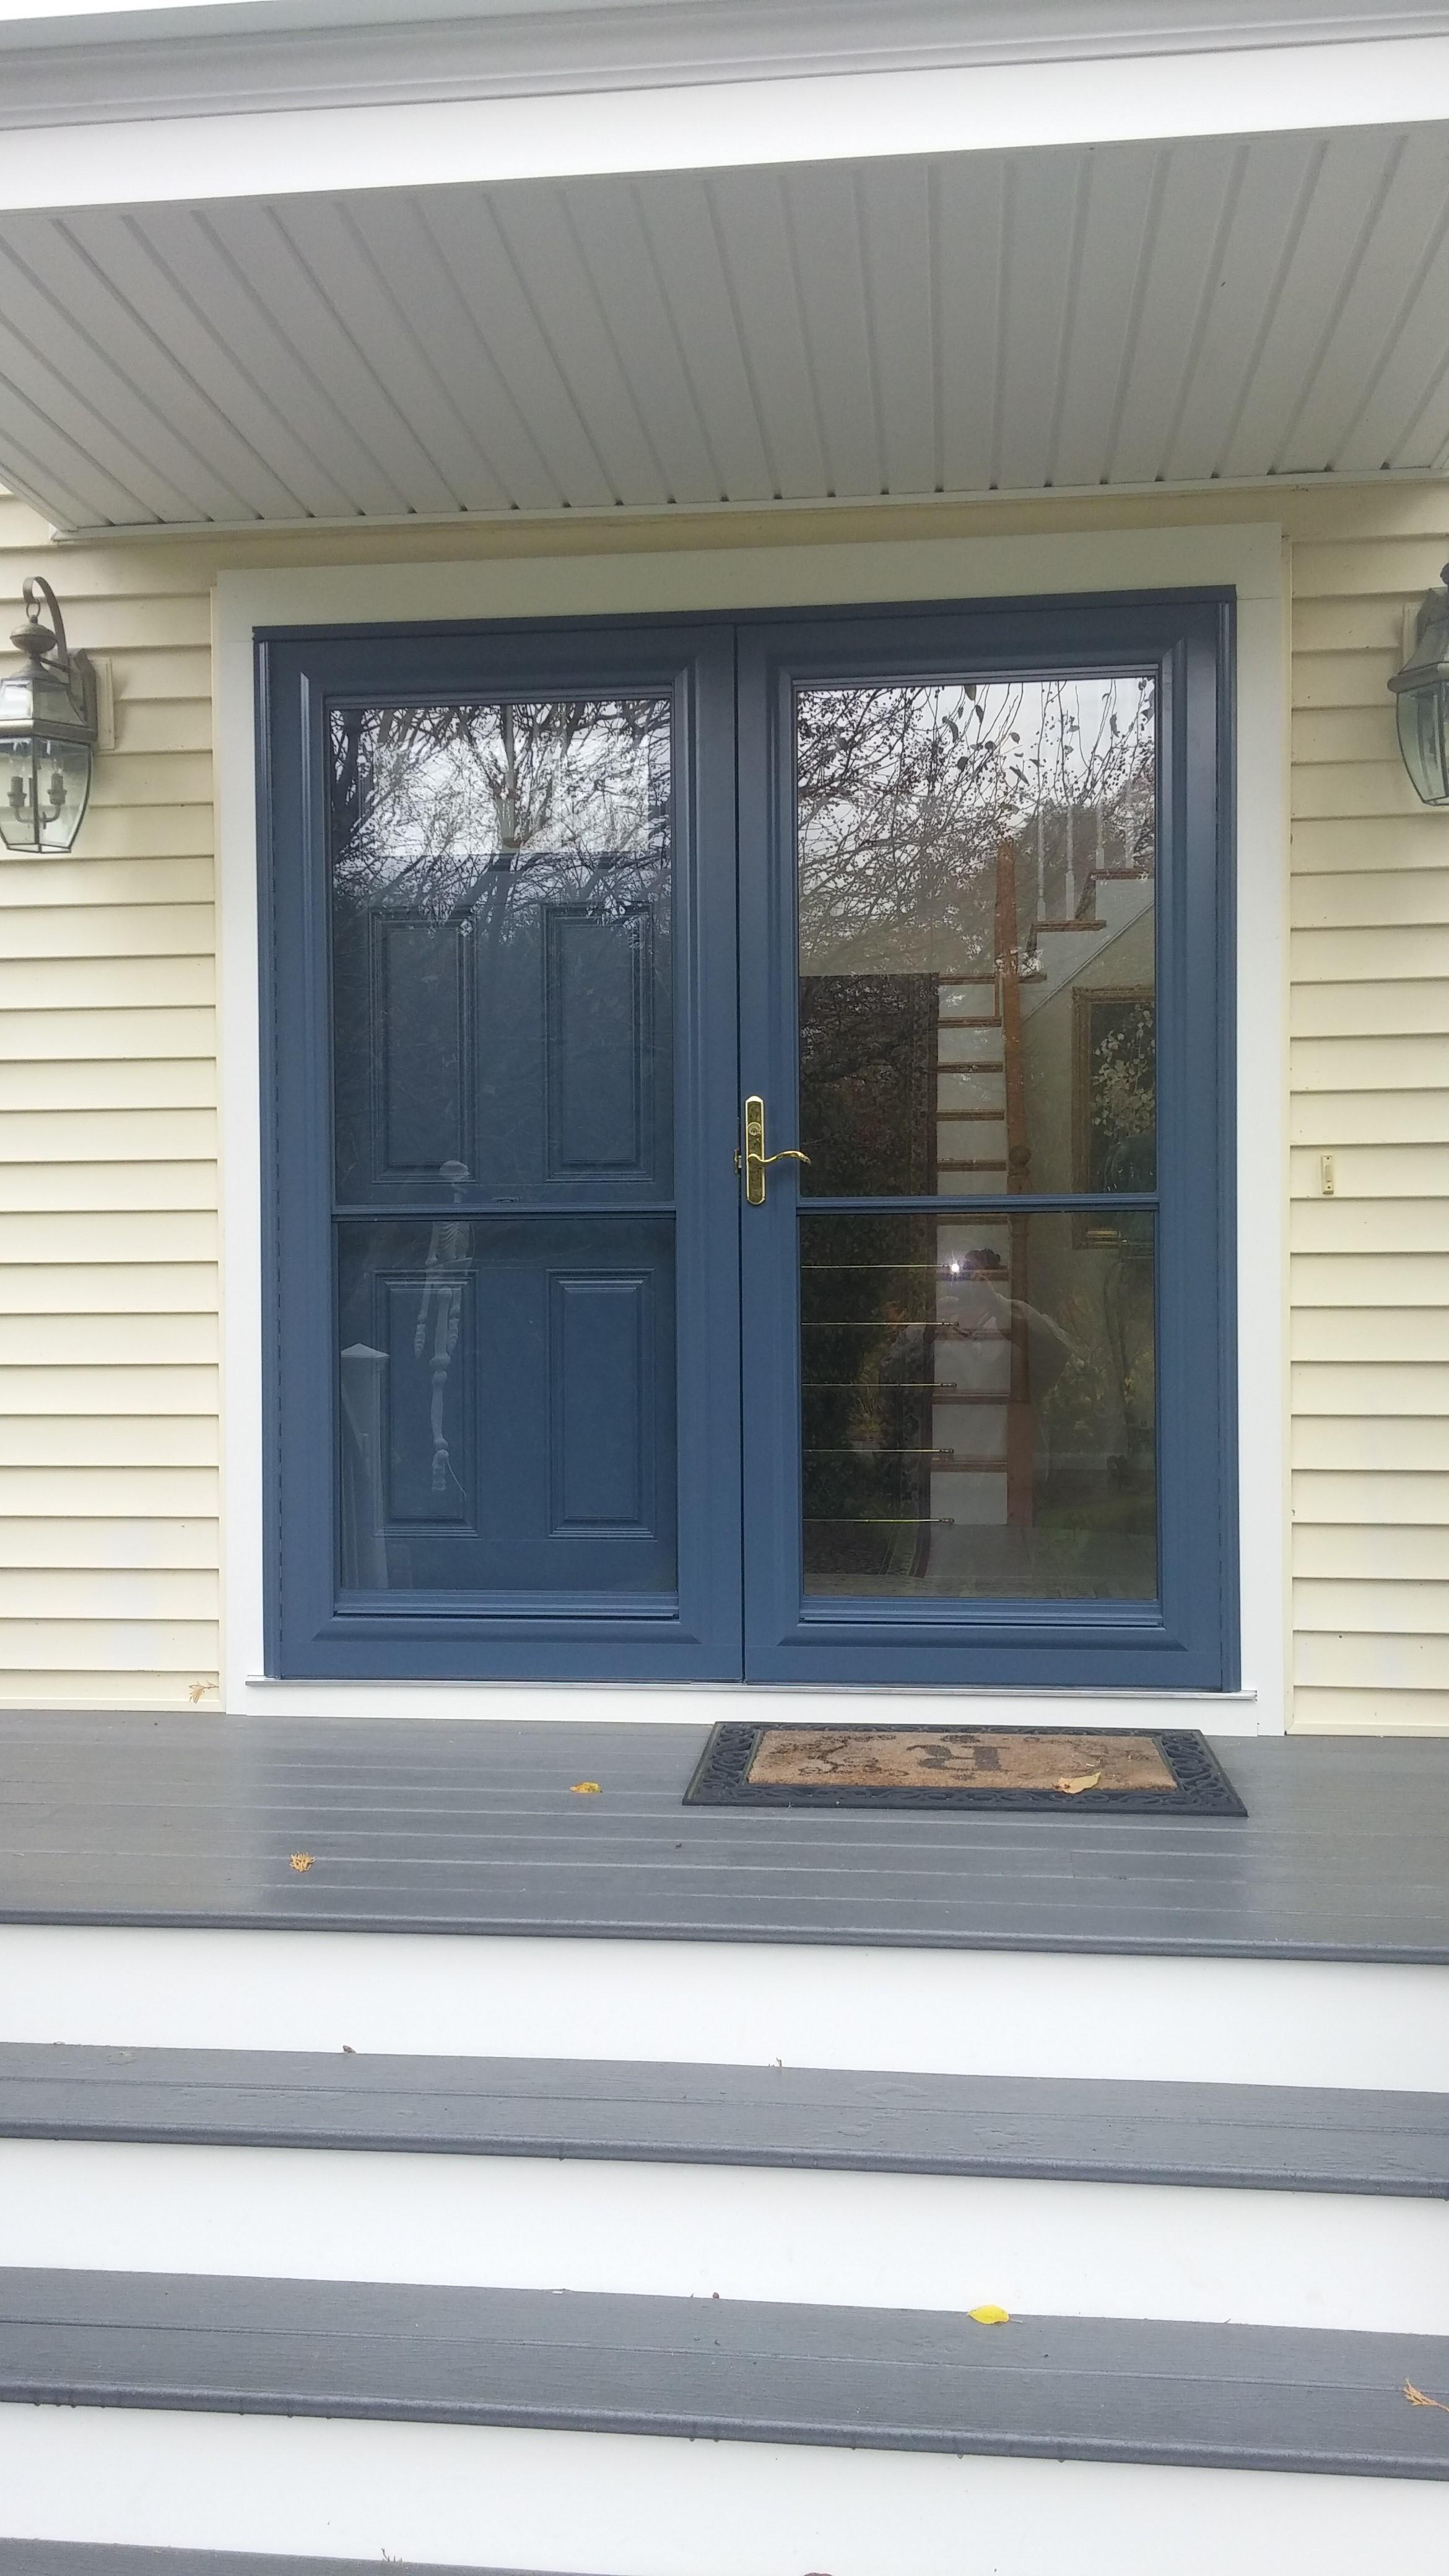 Window and Door Replacements - Framingham MA